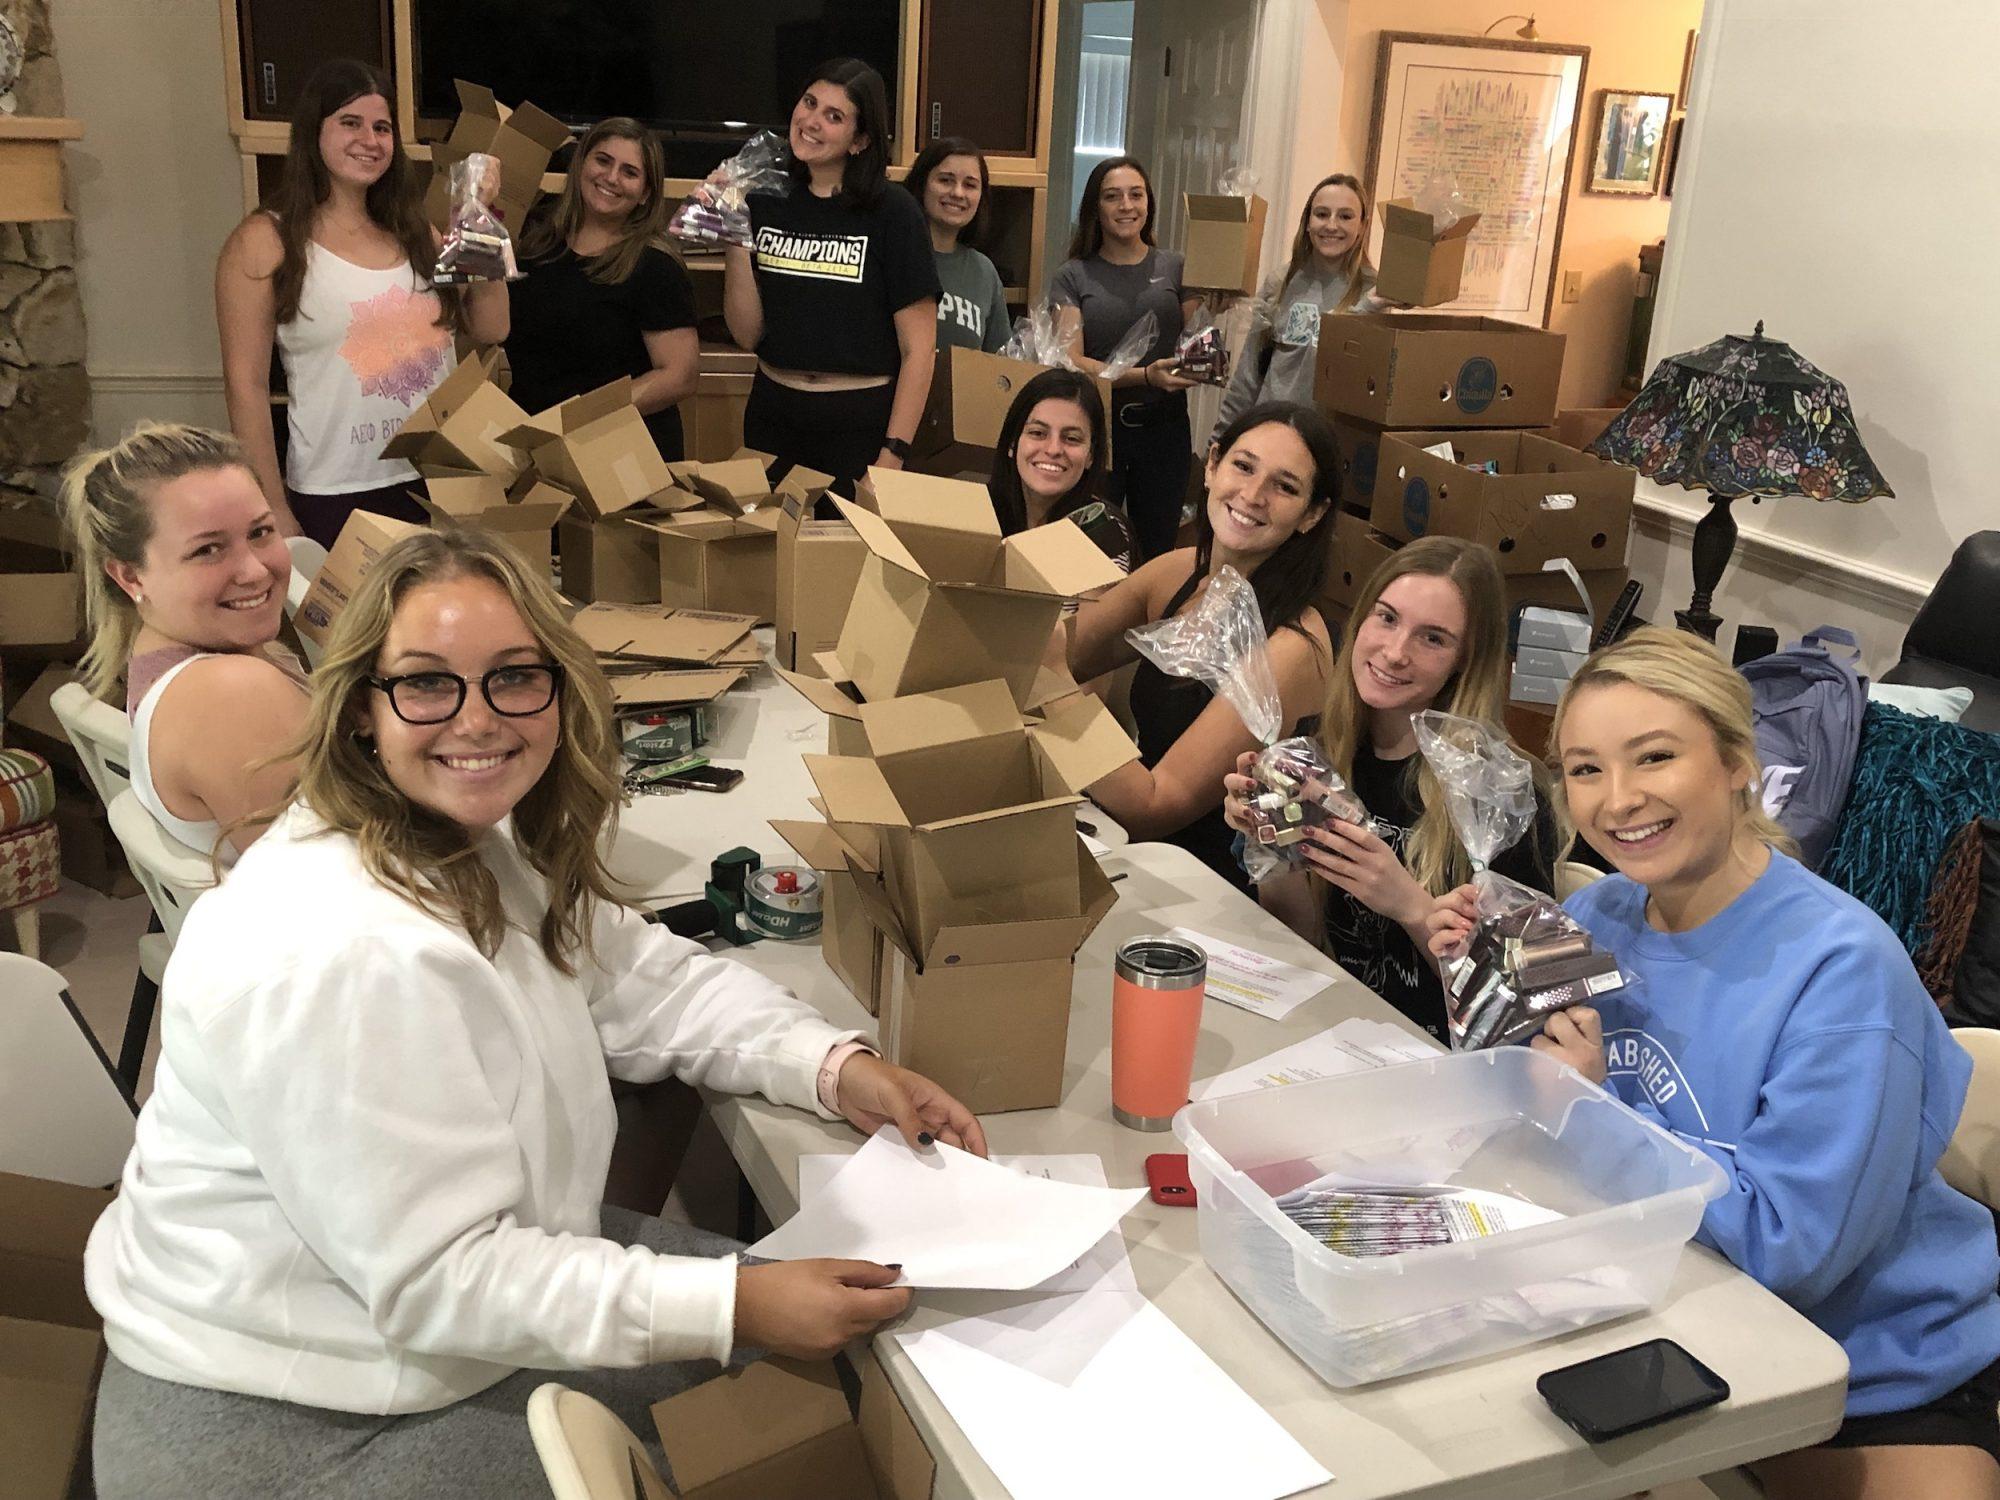 Organizacion dona pintalabios mujeres abuso